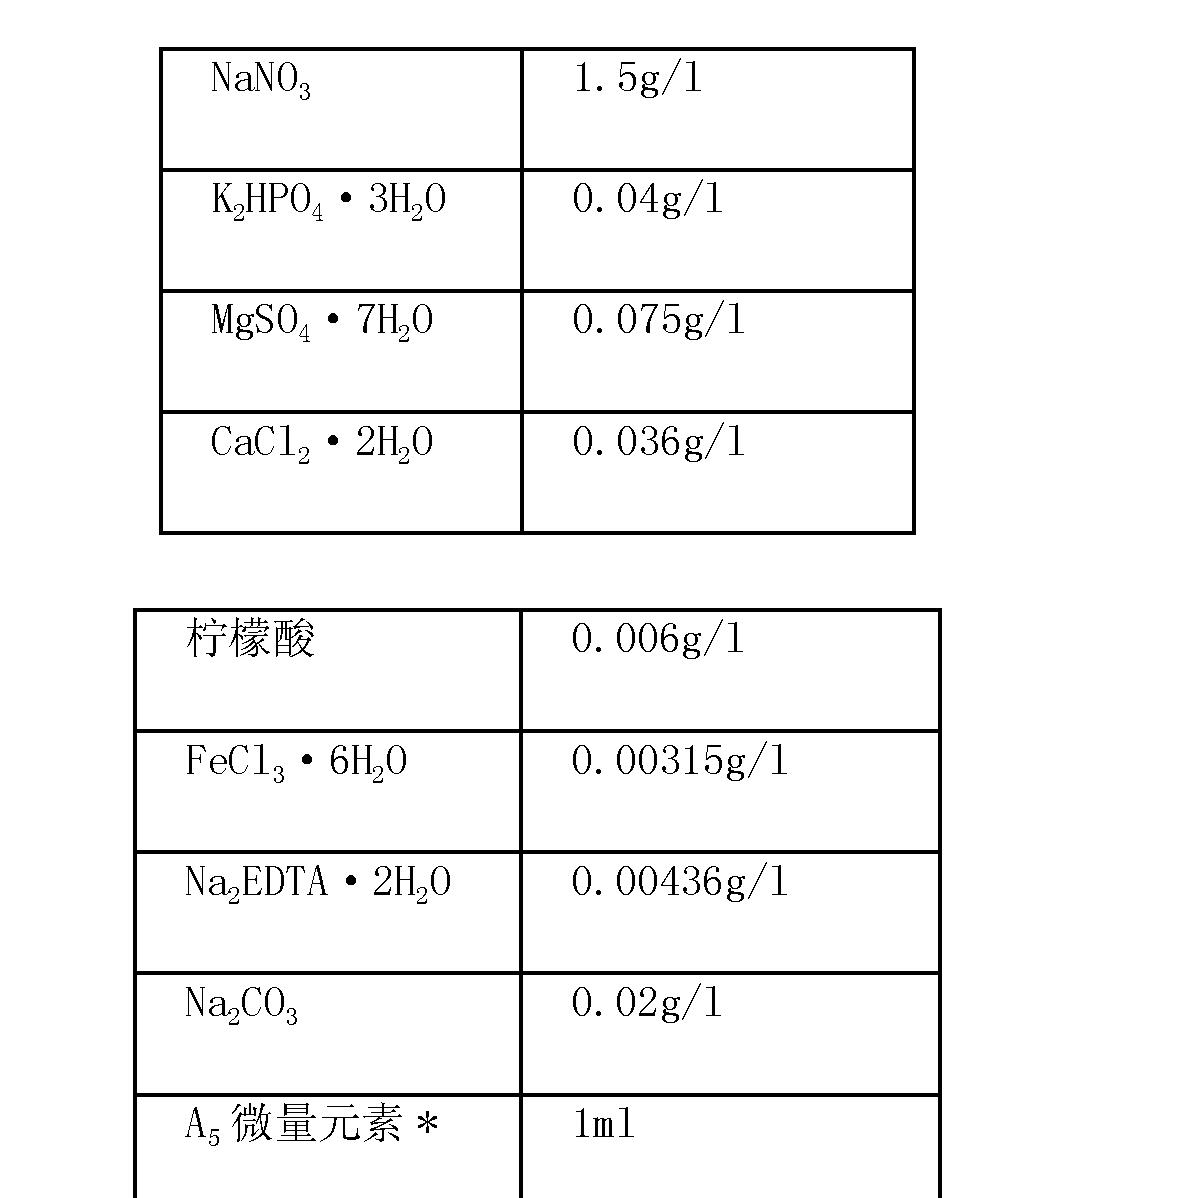 *a5微量元素的组成成分[0078]